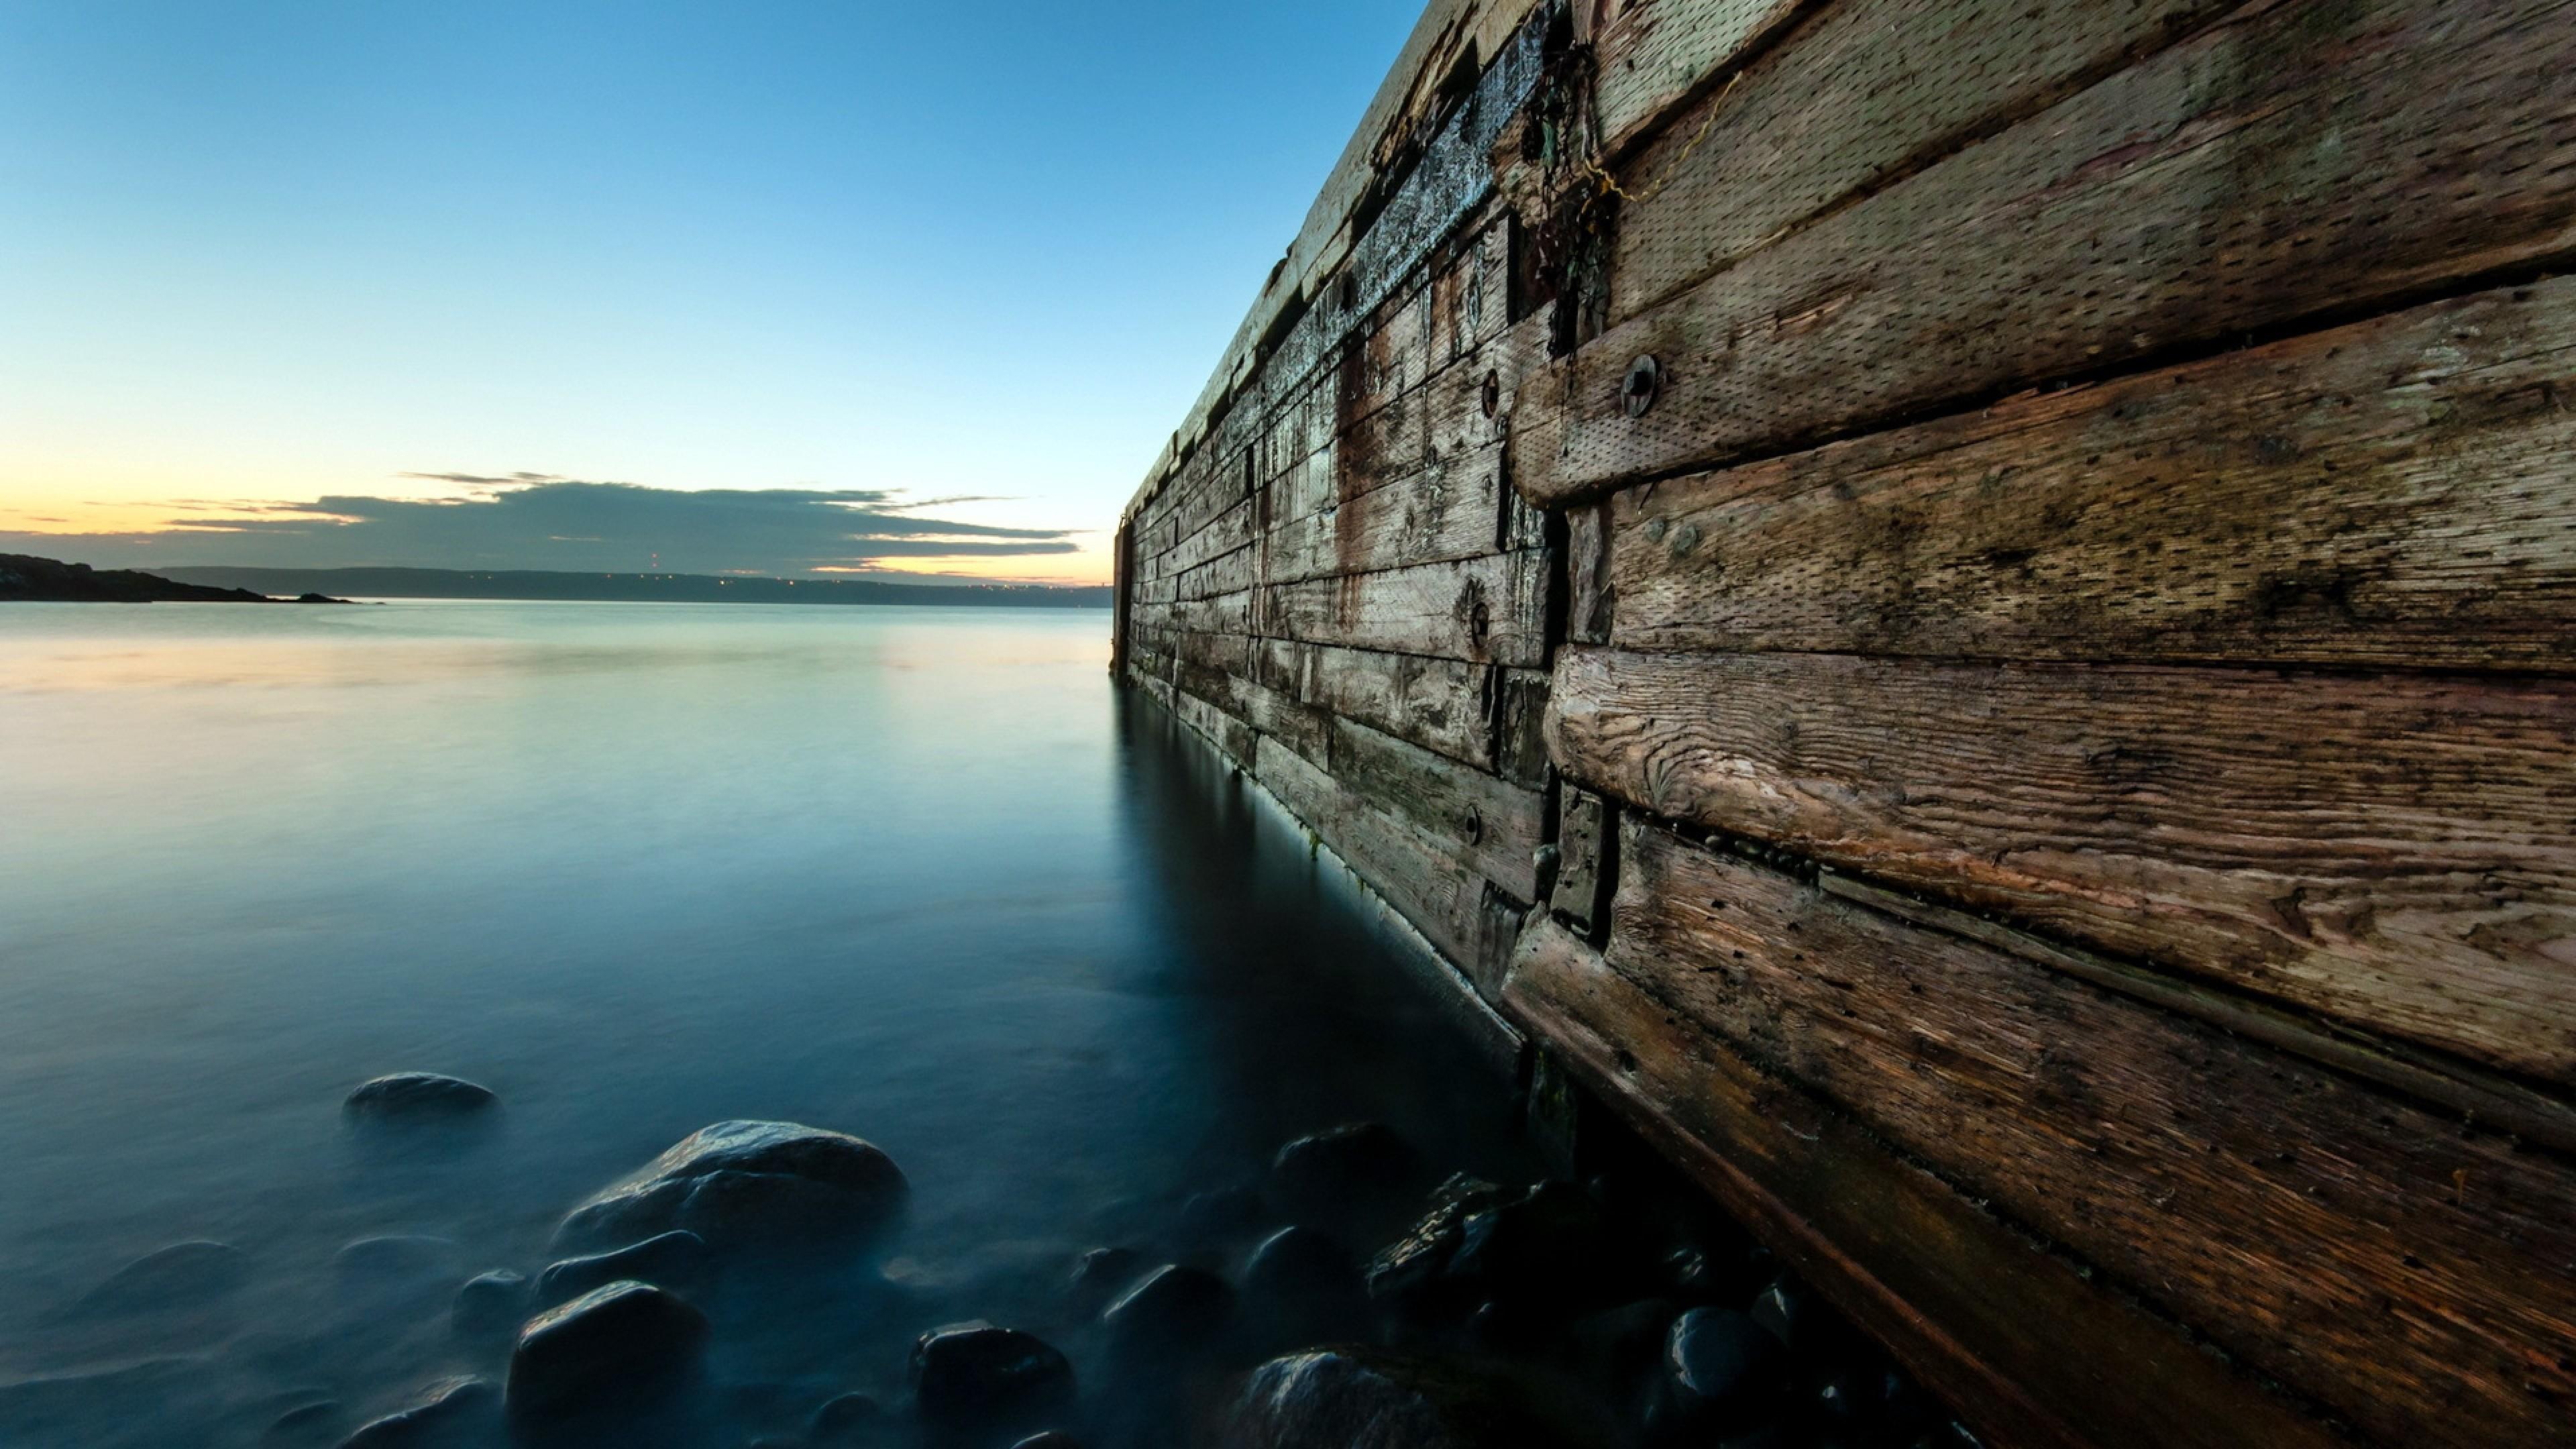 4k Landscape Images As Wallpaper HD